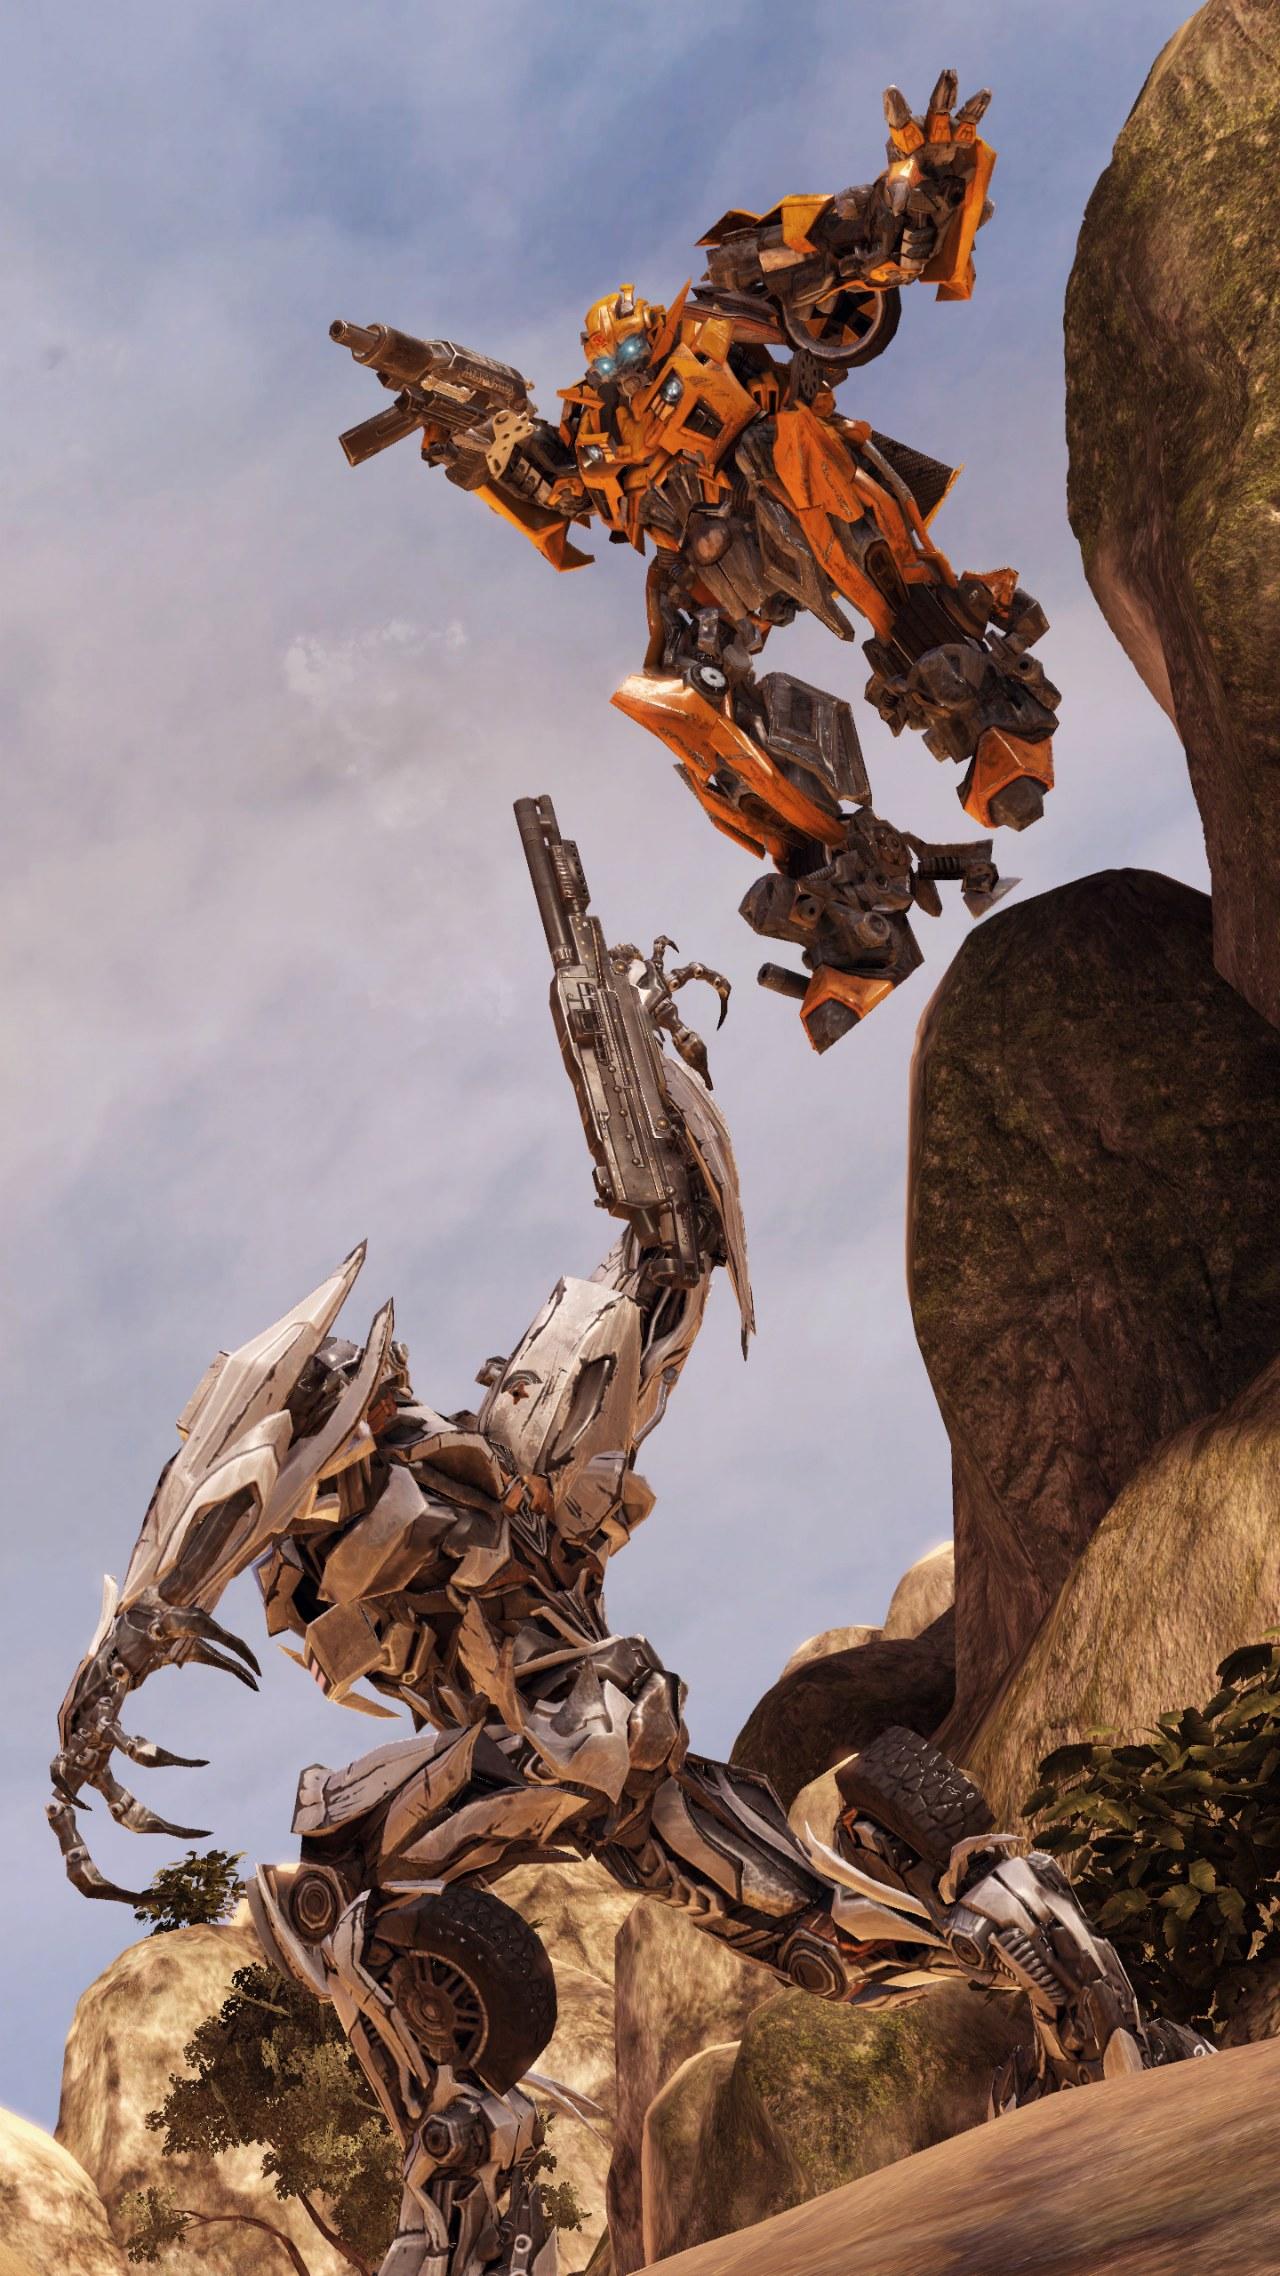 Obrázky z Transformers: Dark of the Moon 39575